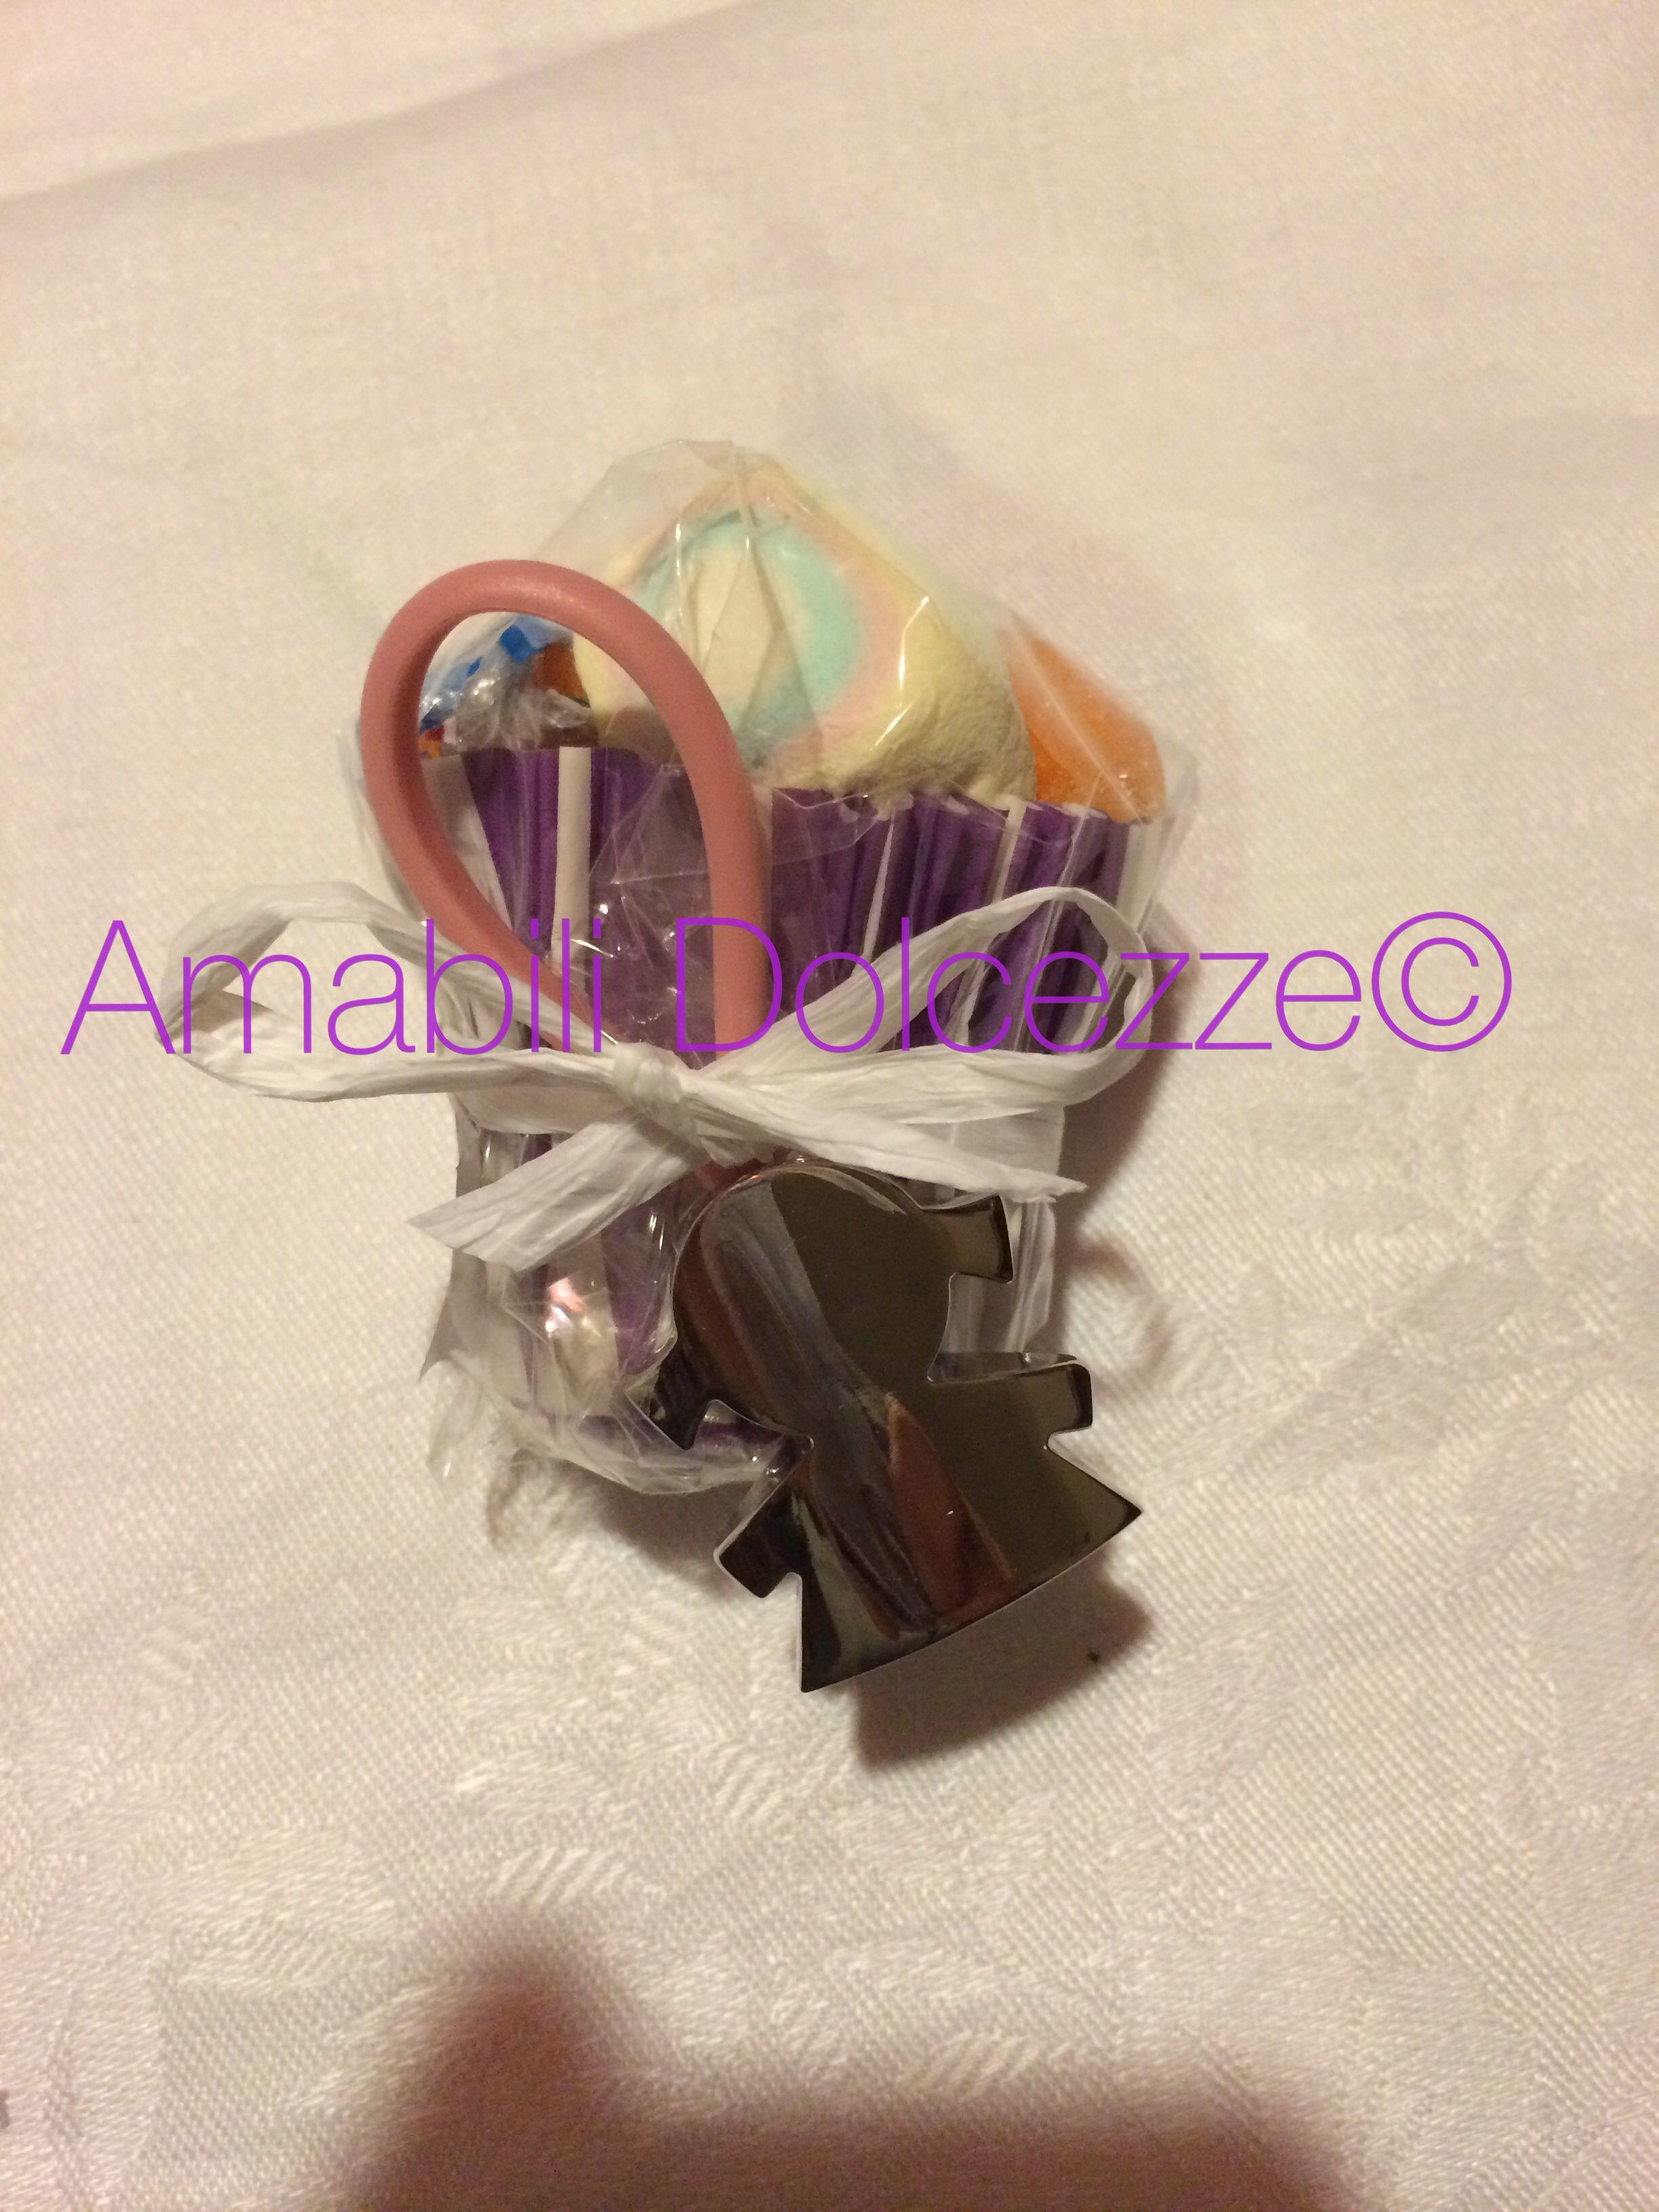 Bomboniera di caramelle. Gustosa !!!  Candy |  marshmallow | per info: amabilidolcezze@gmail.com Visita la pagina www.facebook.com/amabilidolcezze